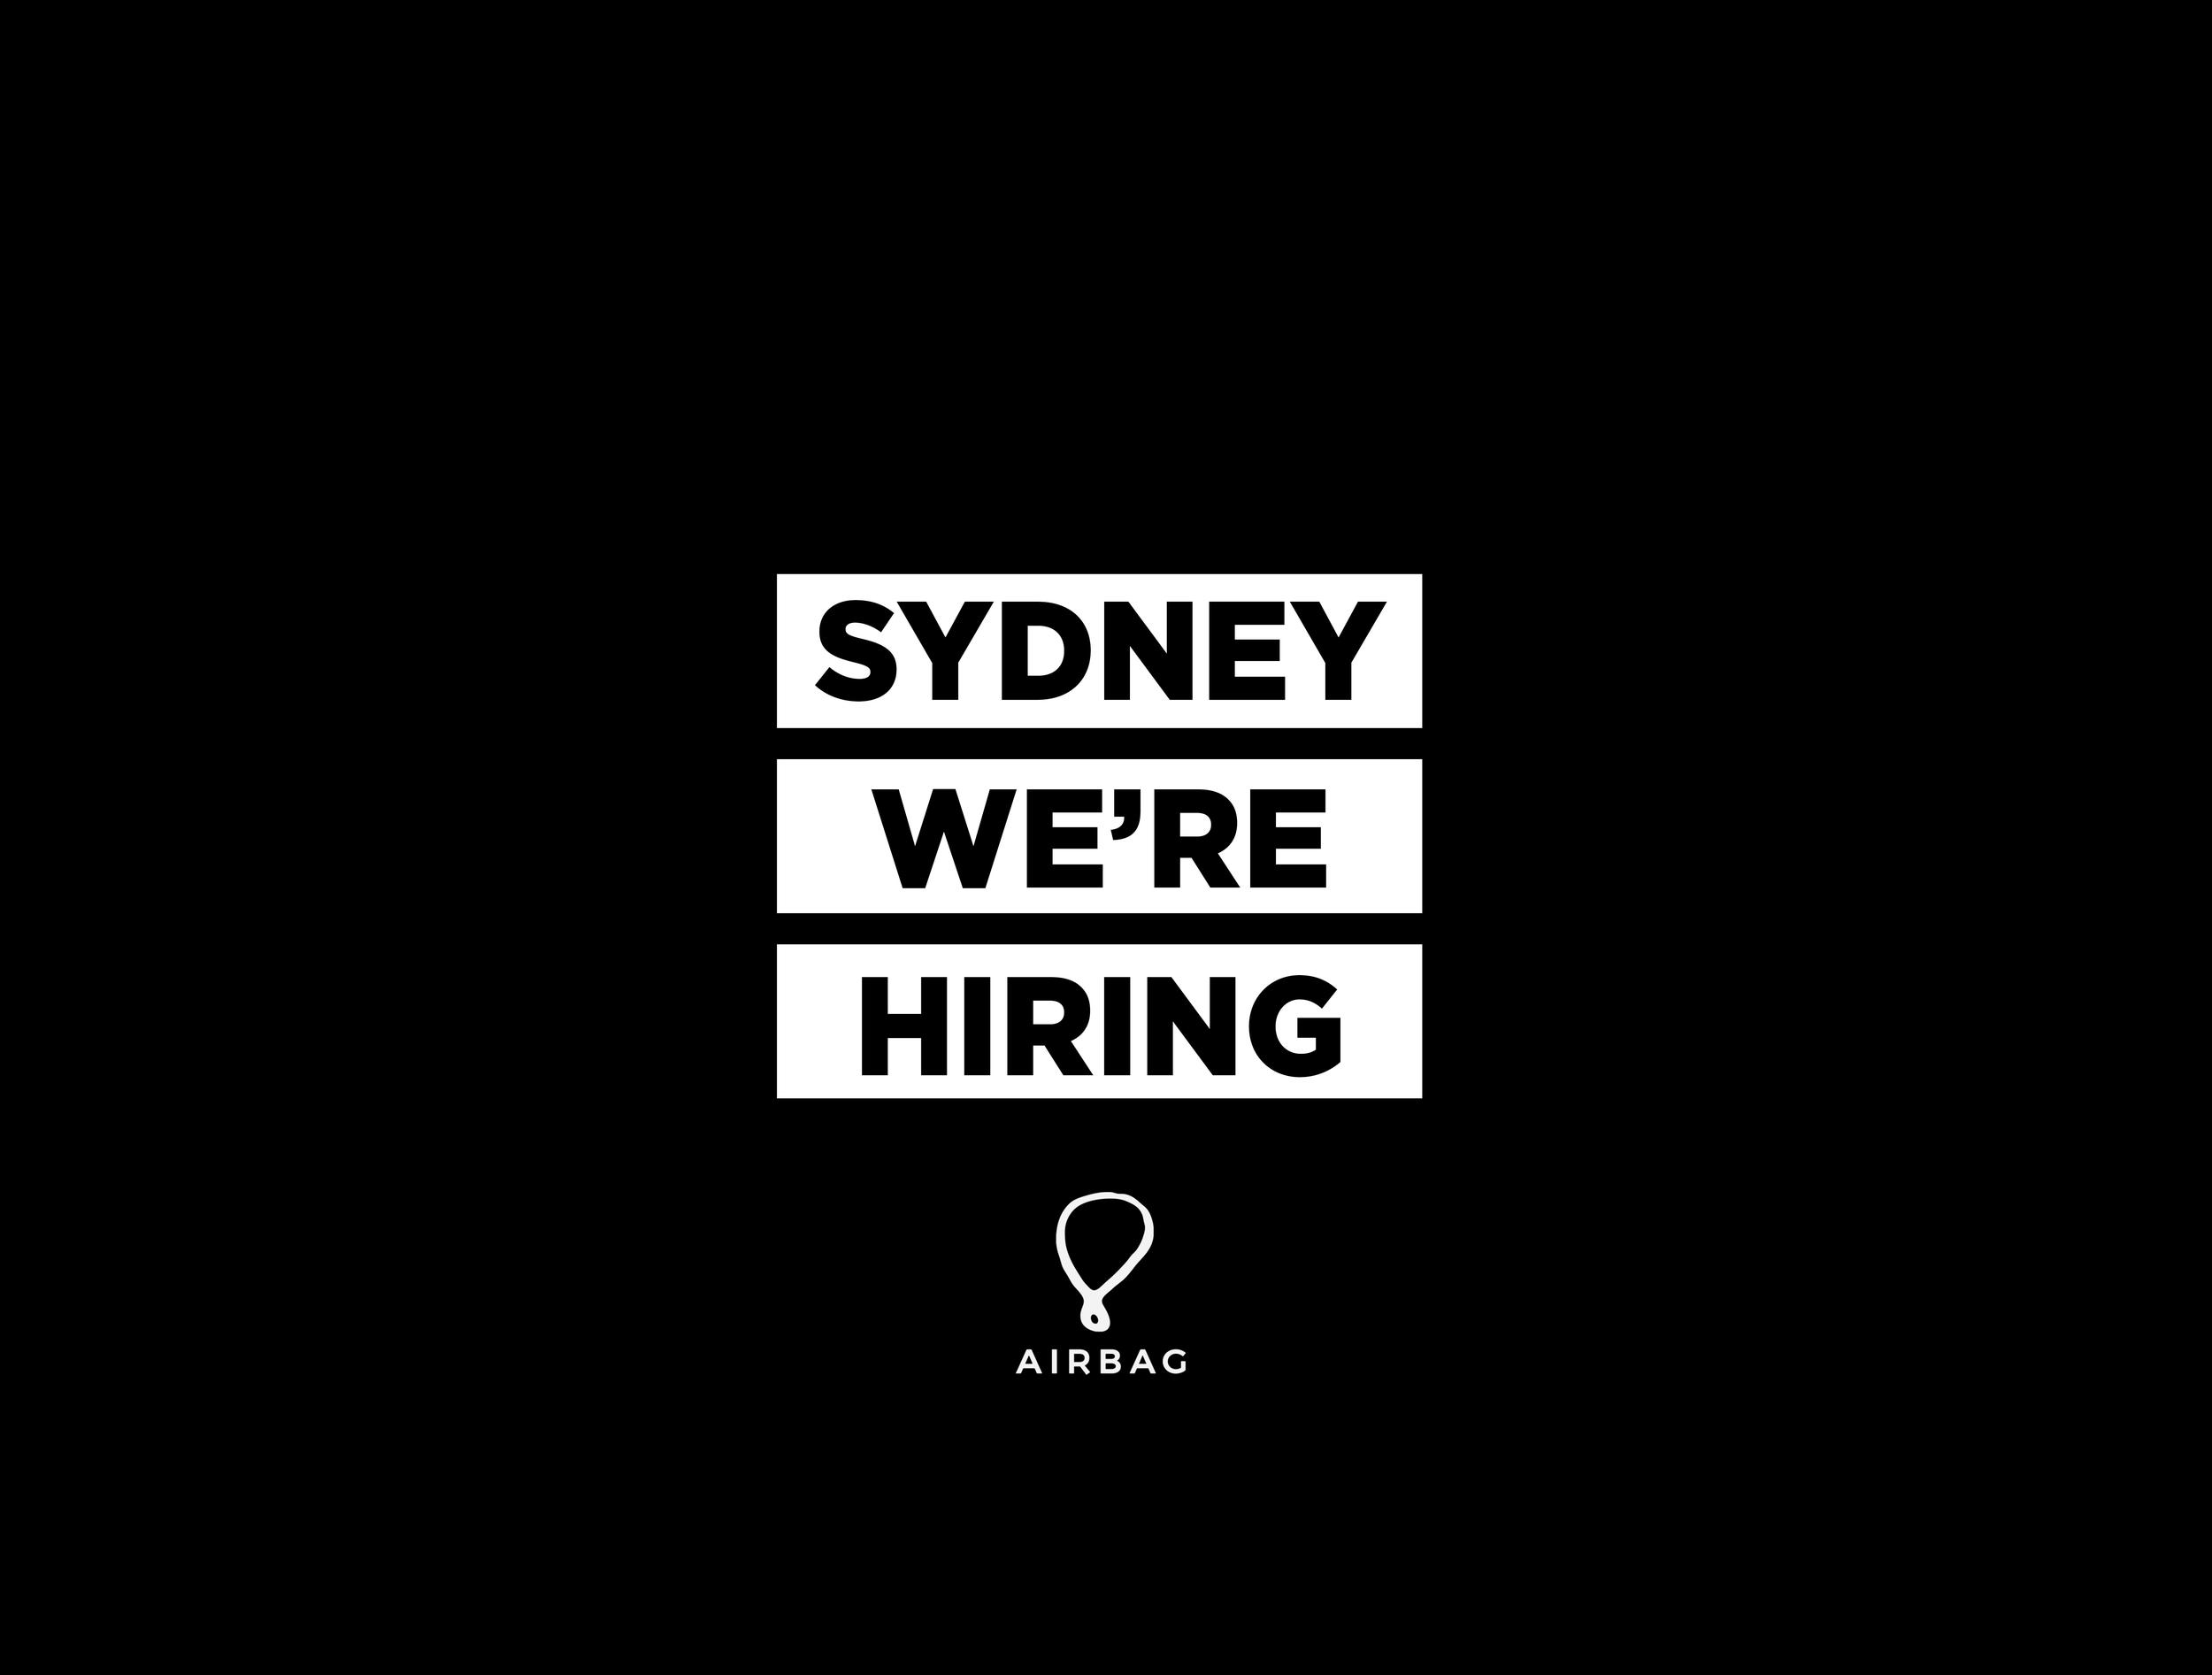 Sydney Hiring Ad.png